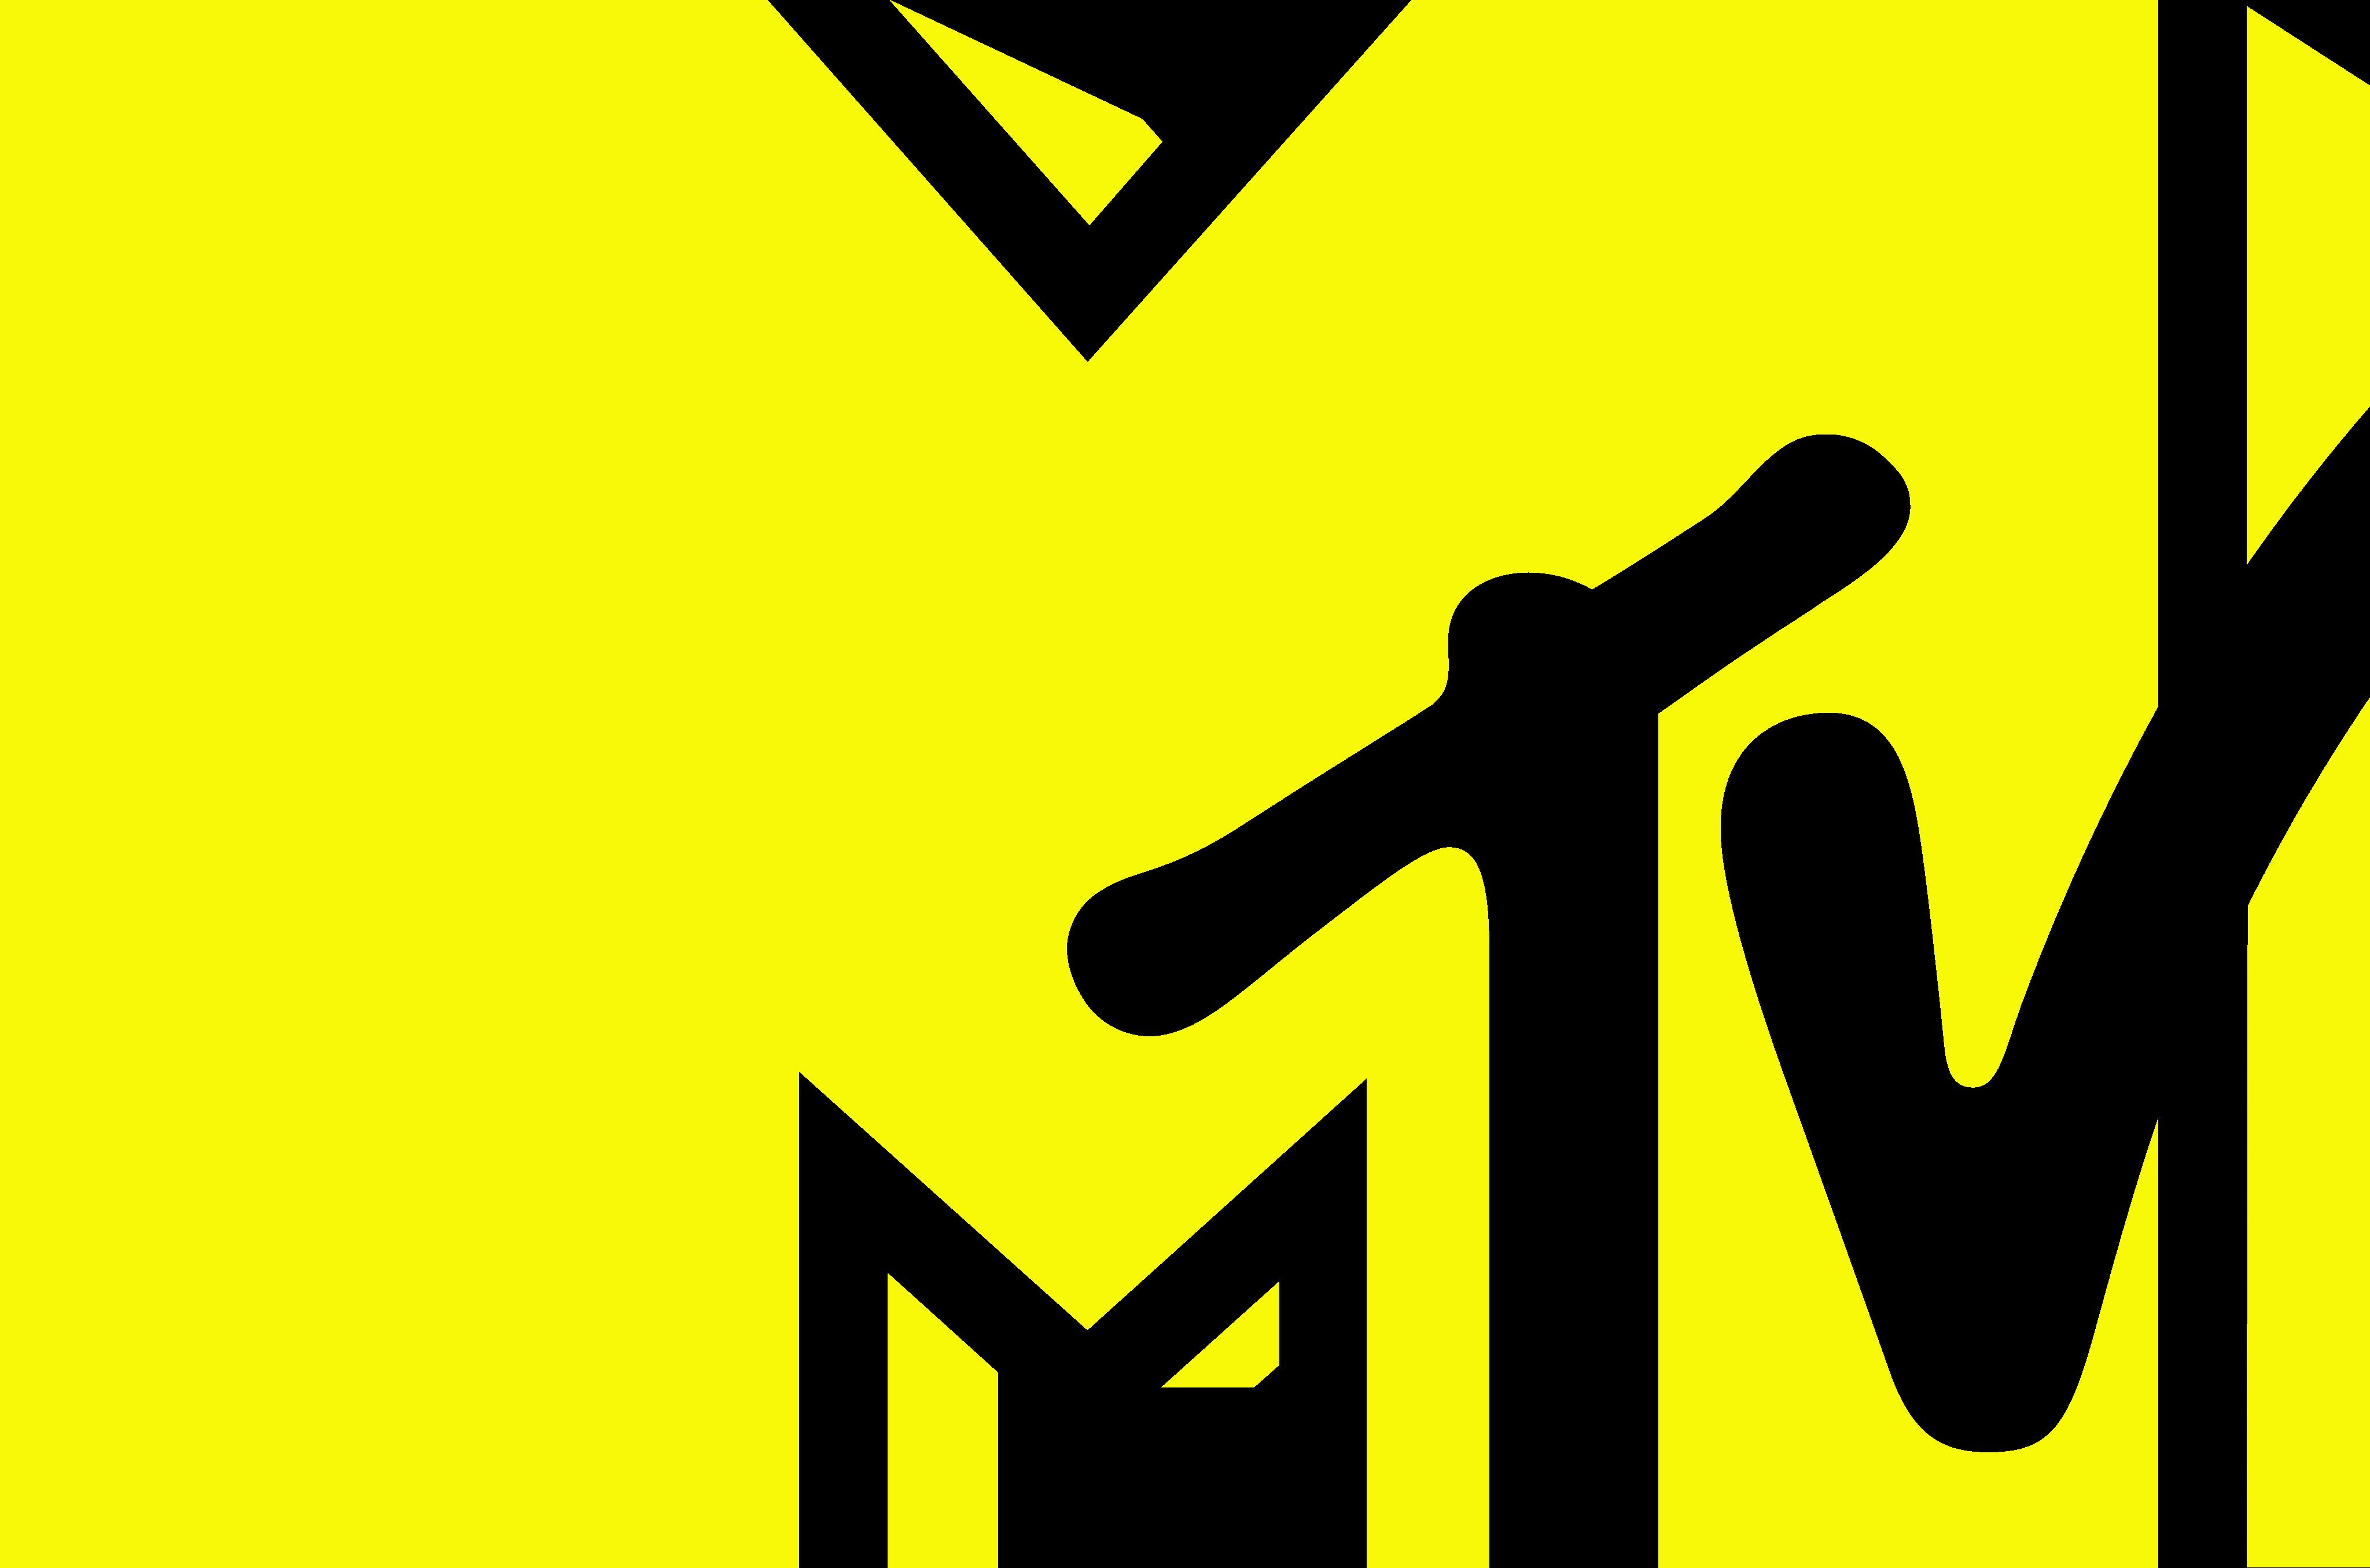 mtv logo - MTV Logo